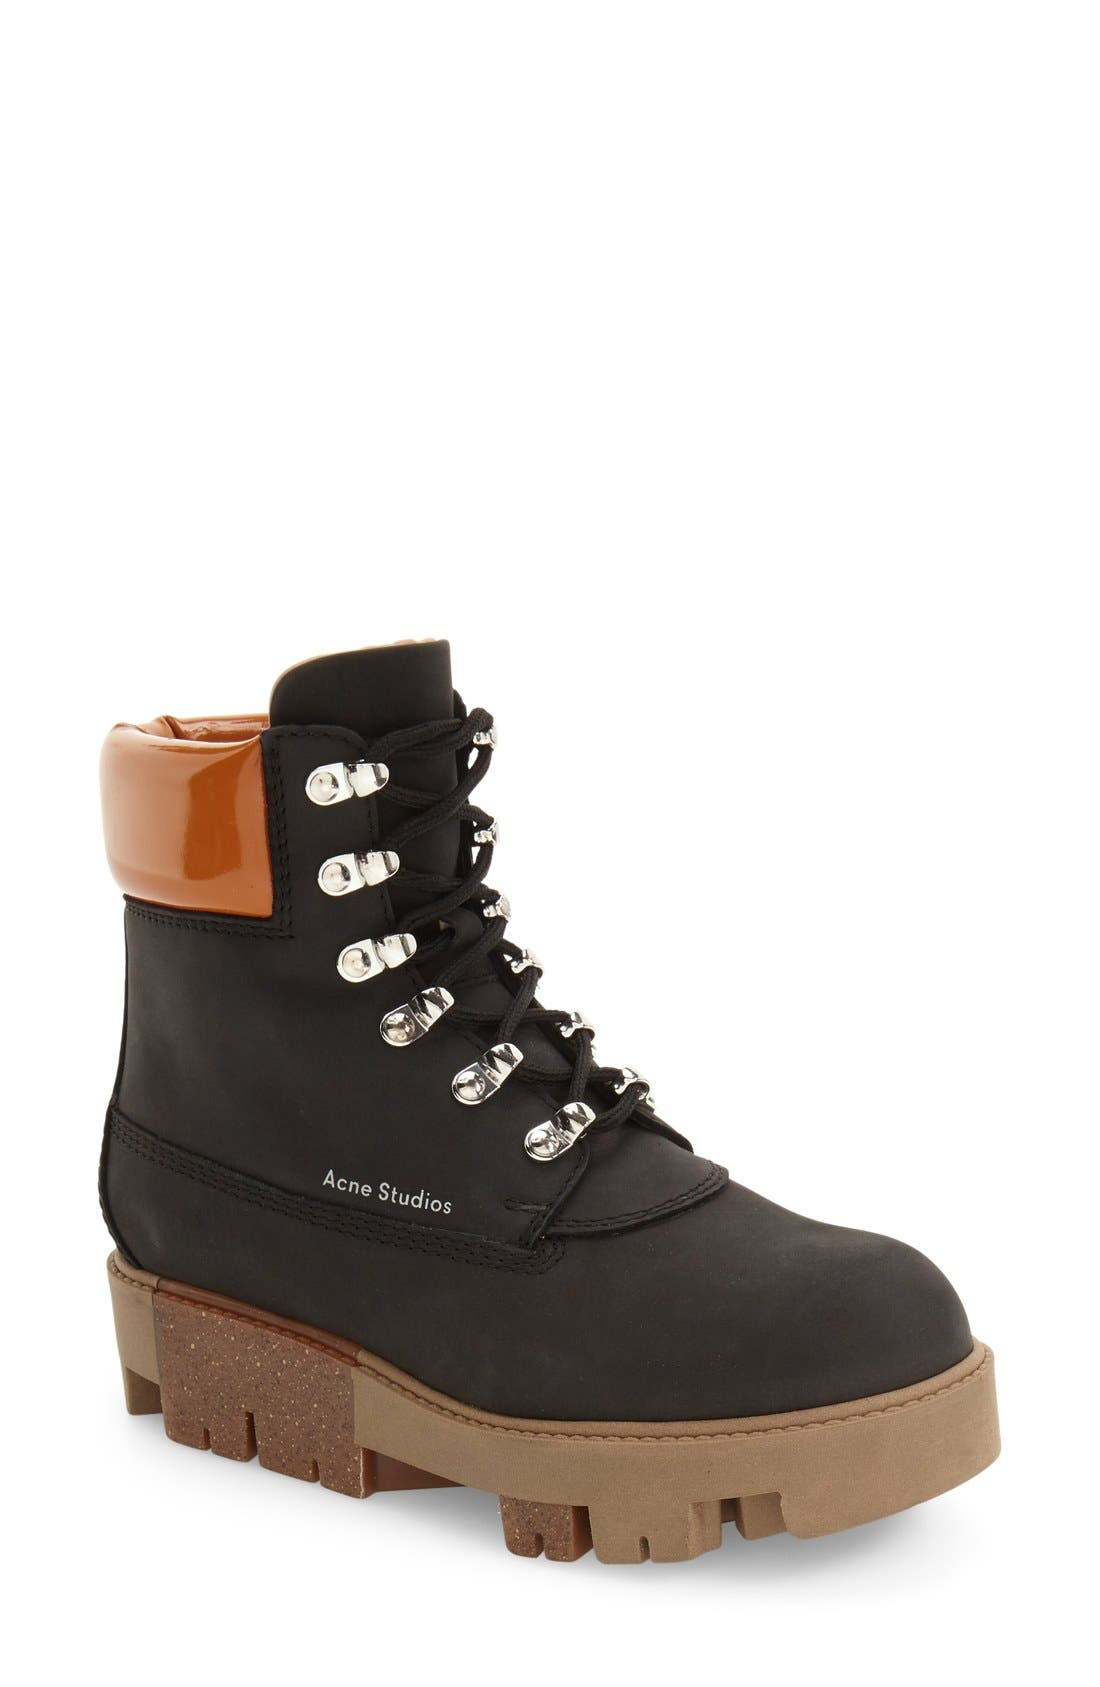 ACNE Studios Telda Hiker Boot (Women)